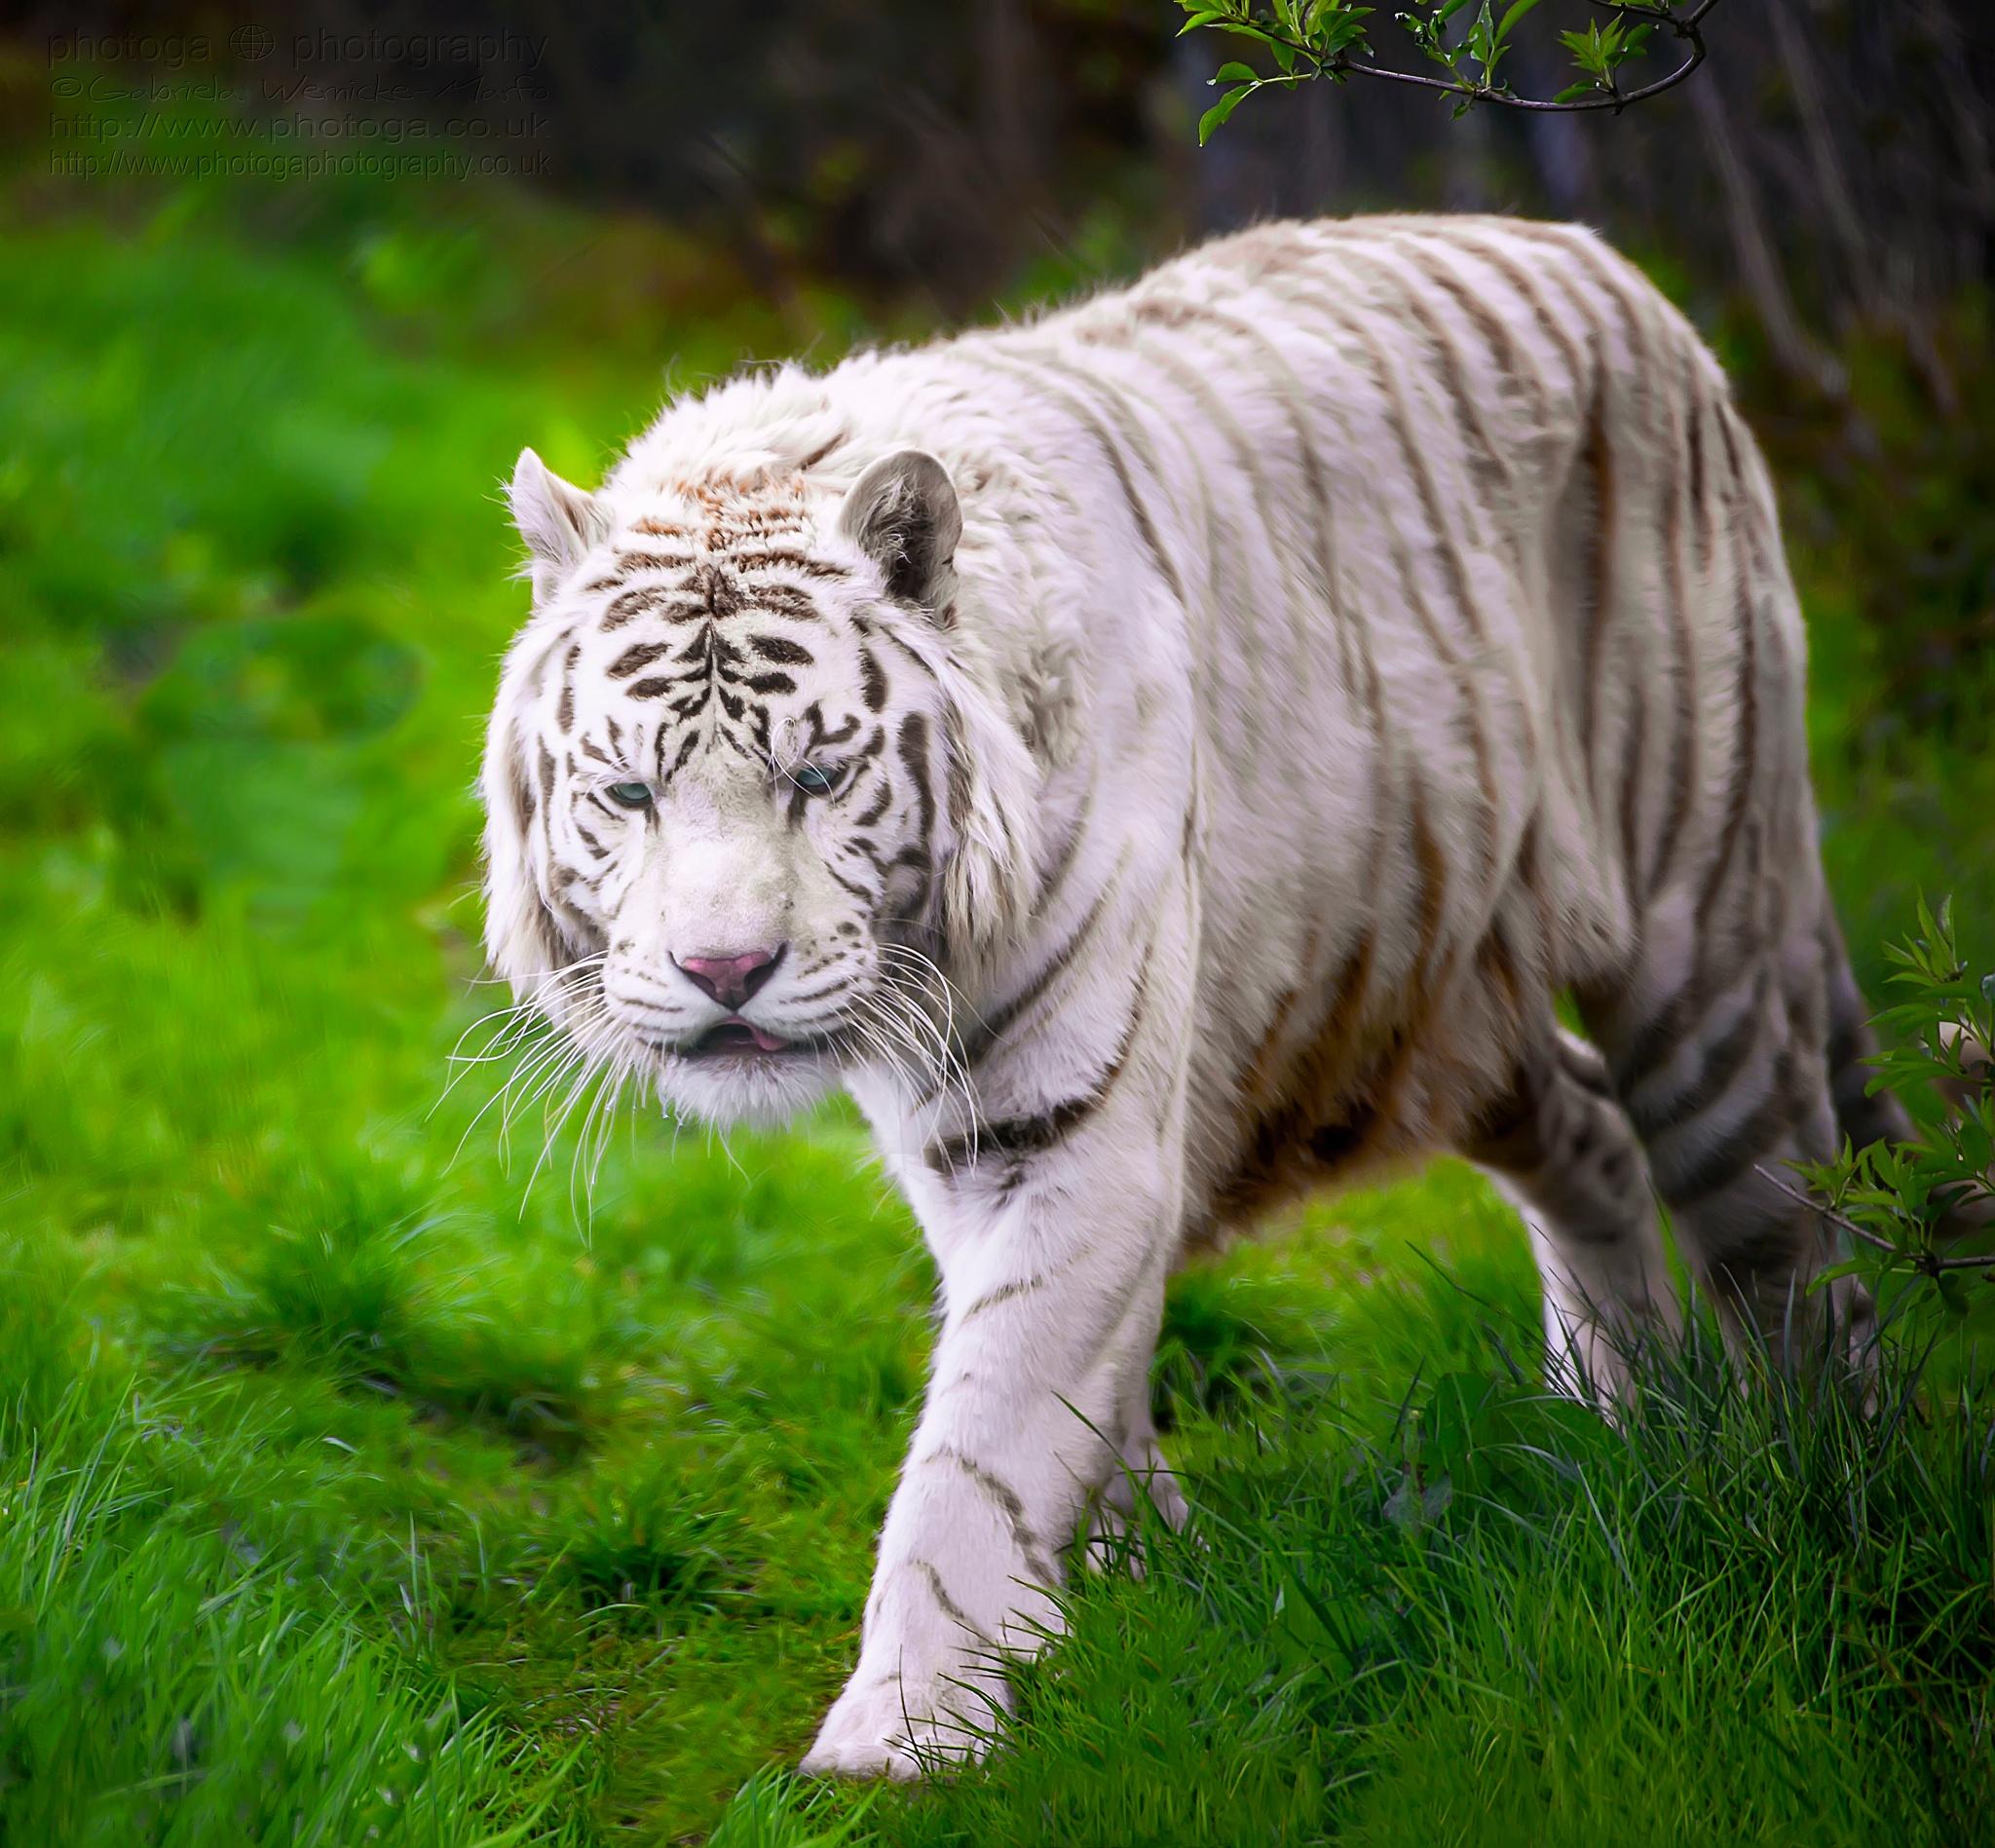 Shere Khan by photogaphotography